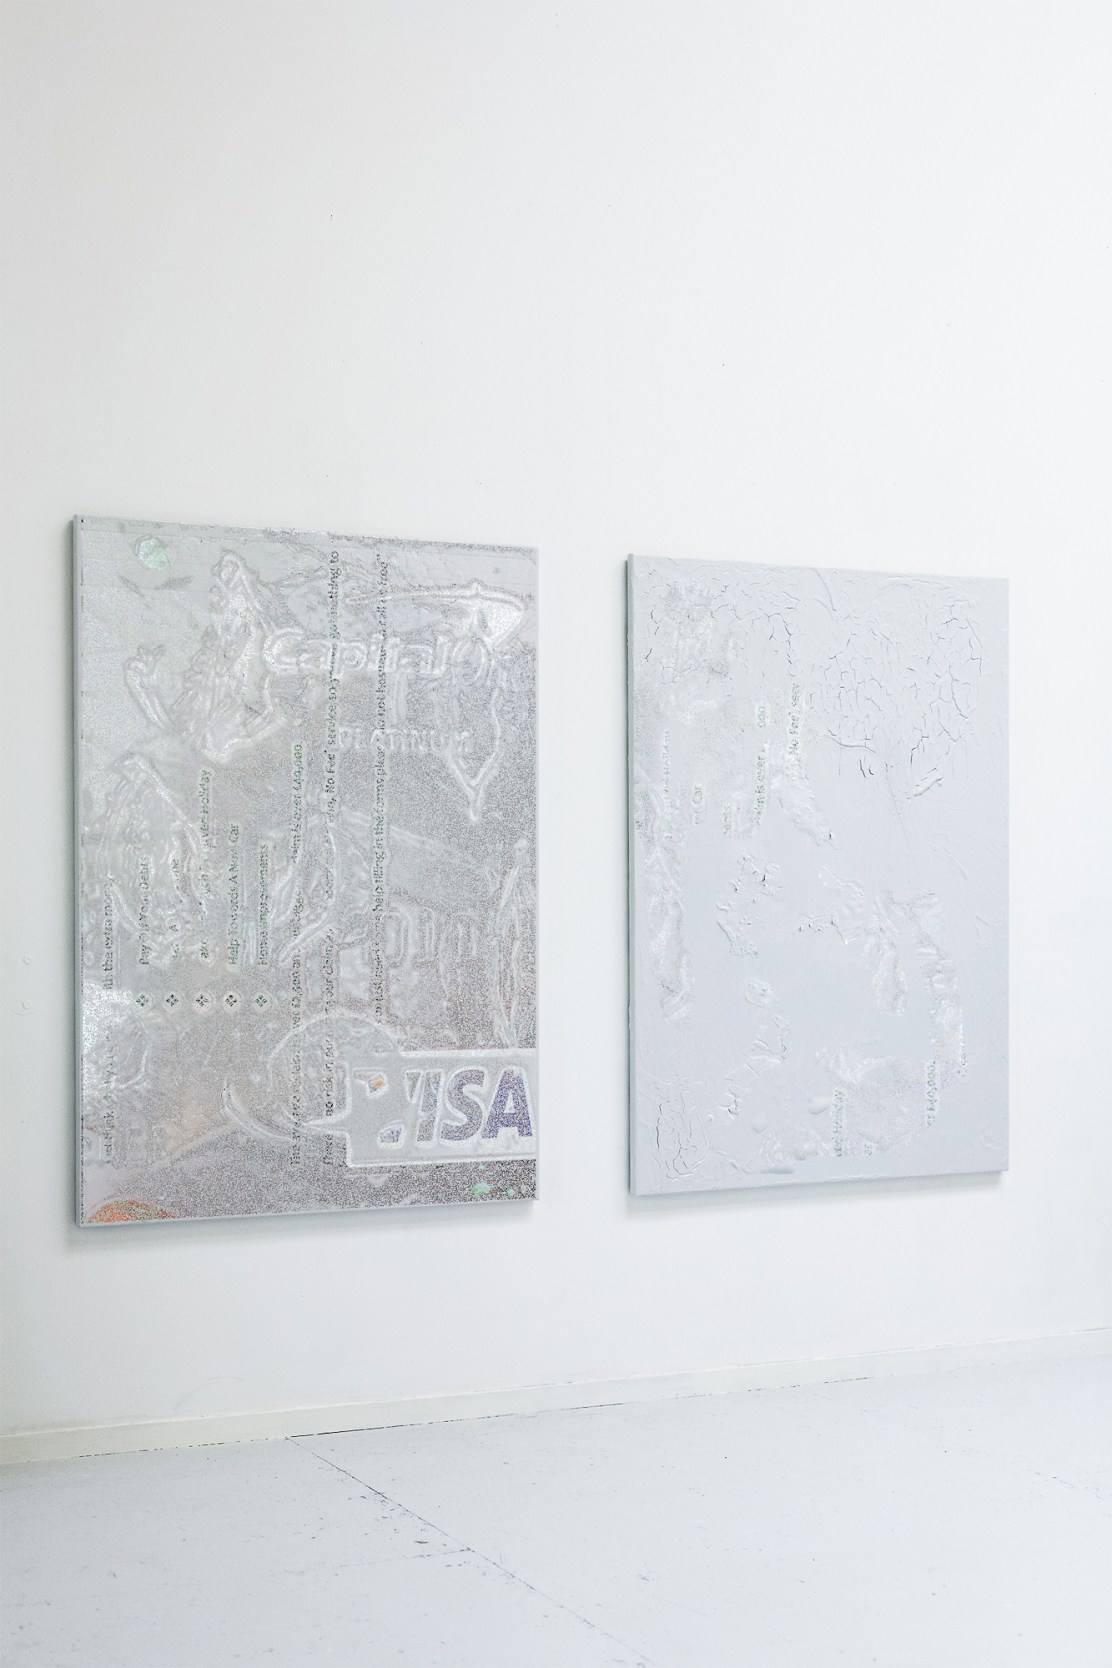 31-Martijn-Hendriks-Not-Yet-Titled-studio-image-from-artist's-instagram-account-(5)